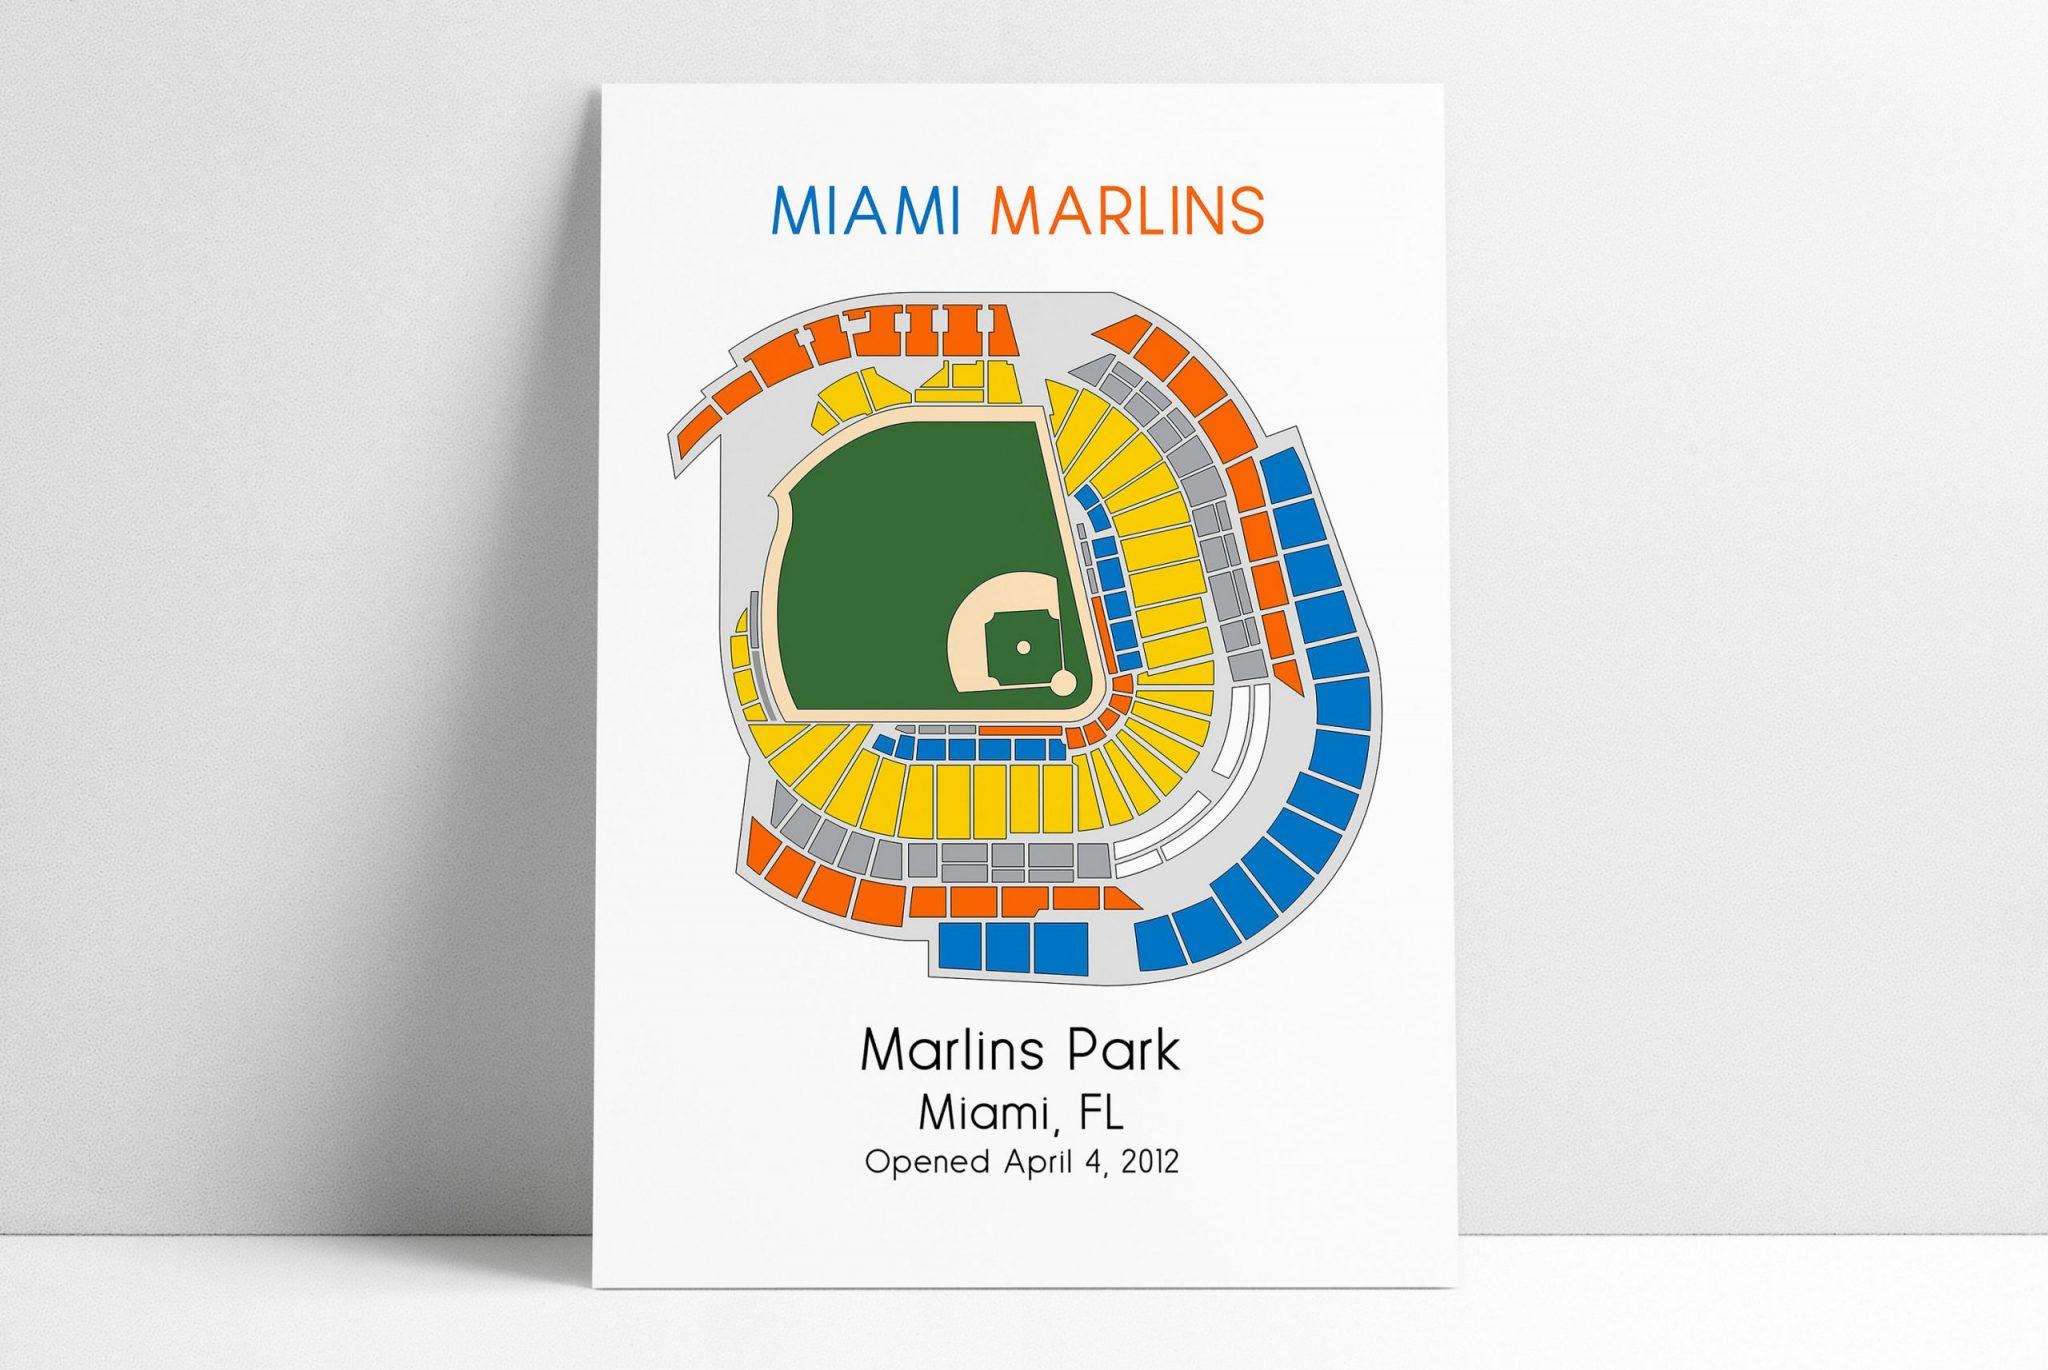 miami marlins baseball map, mlb stadium map, ballpark map